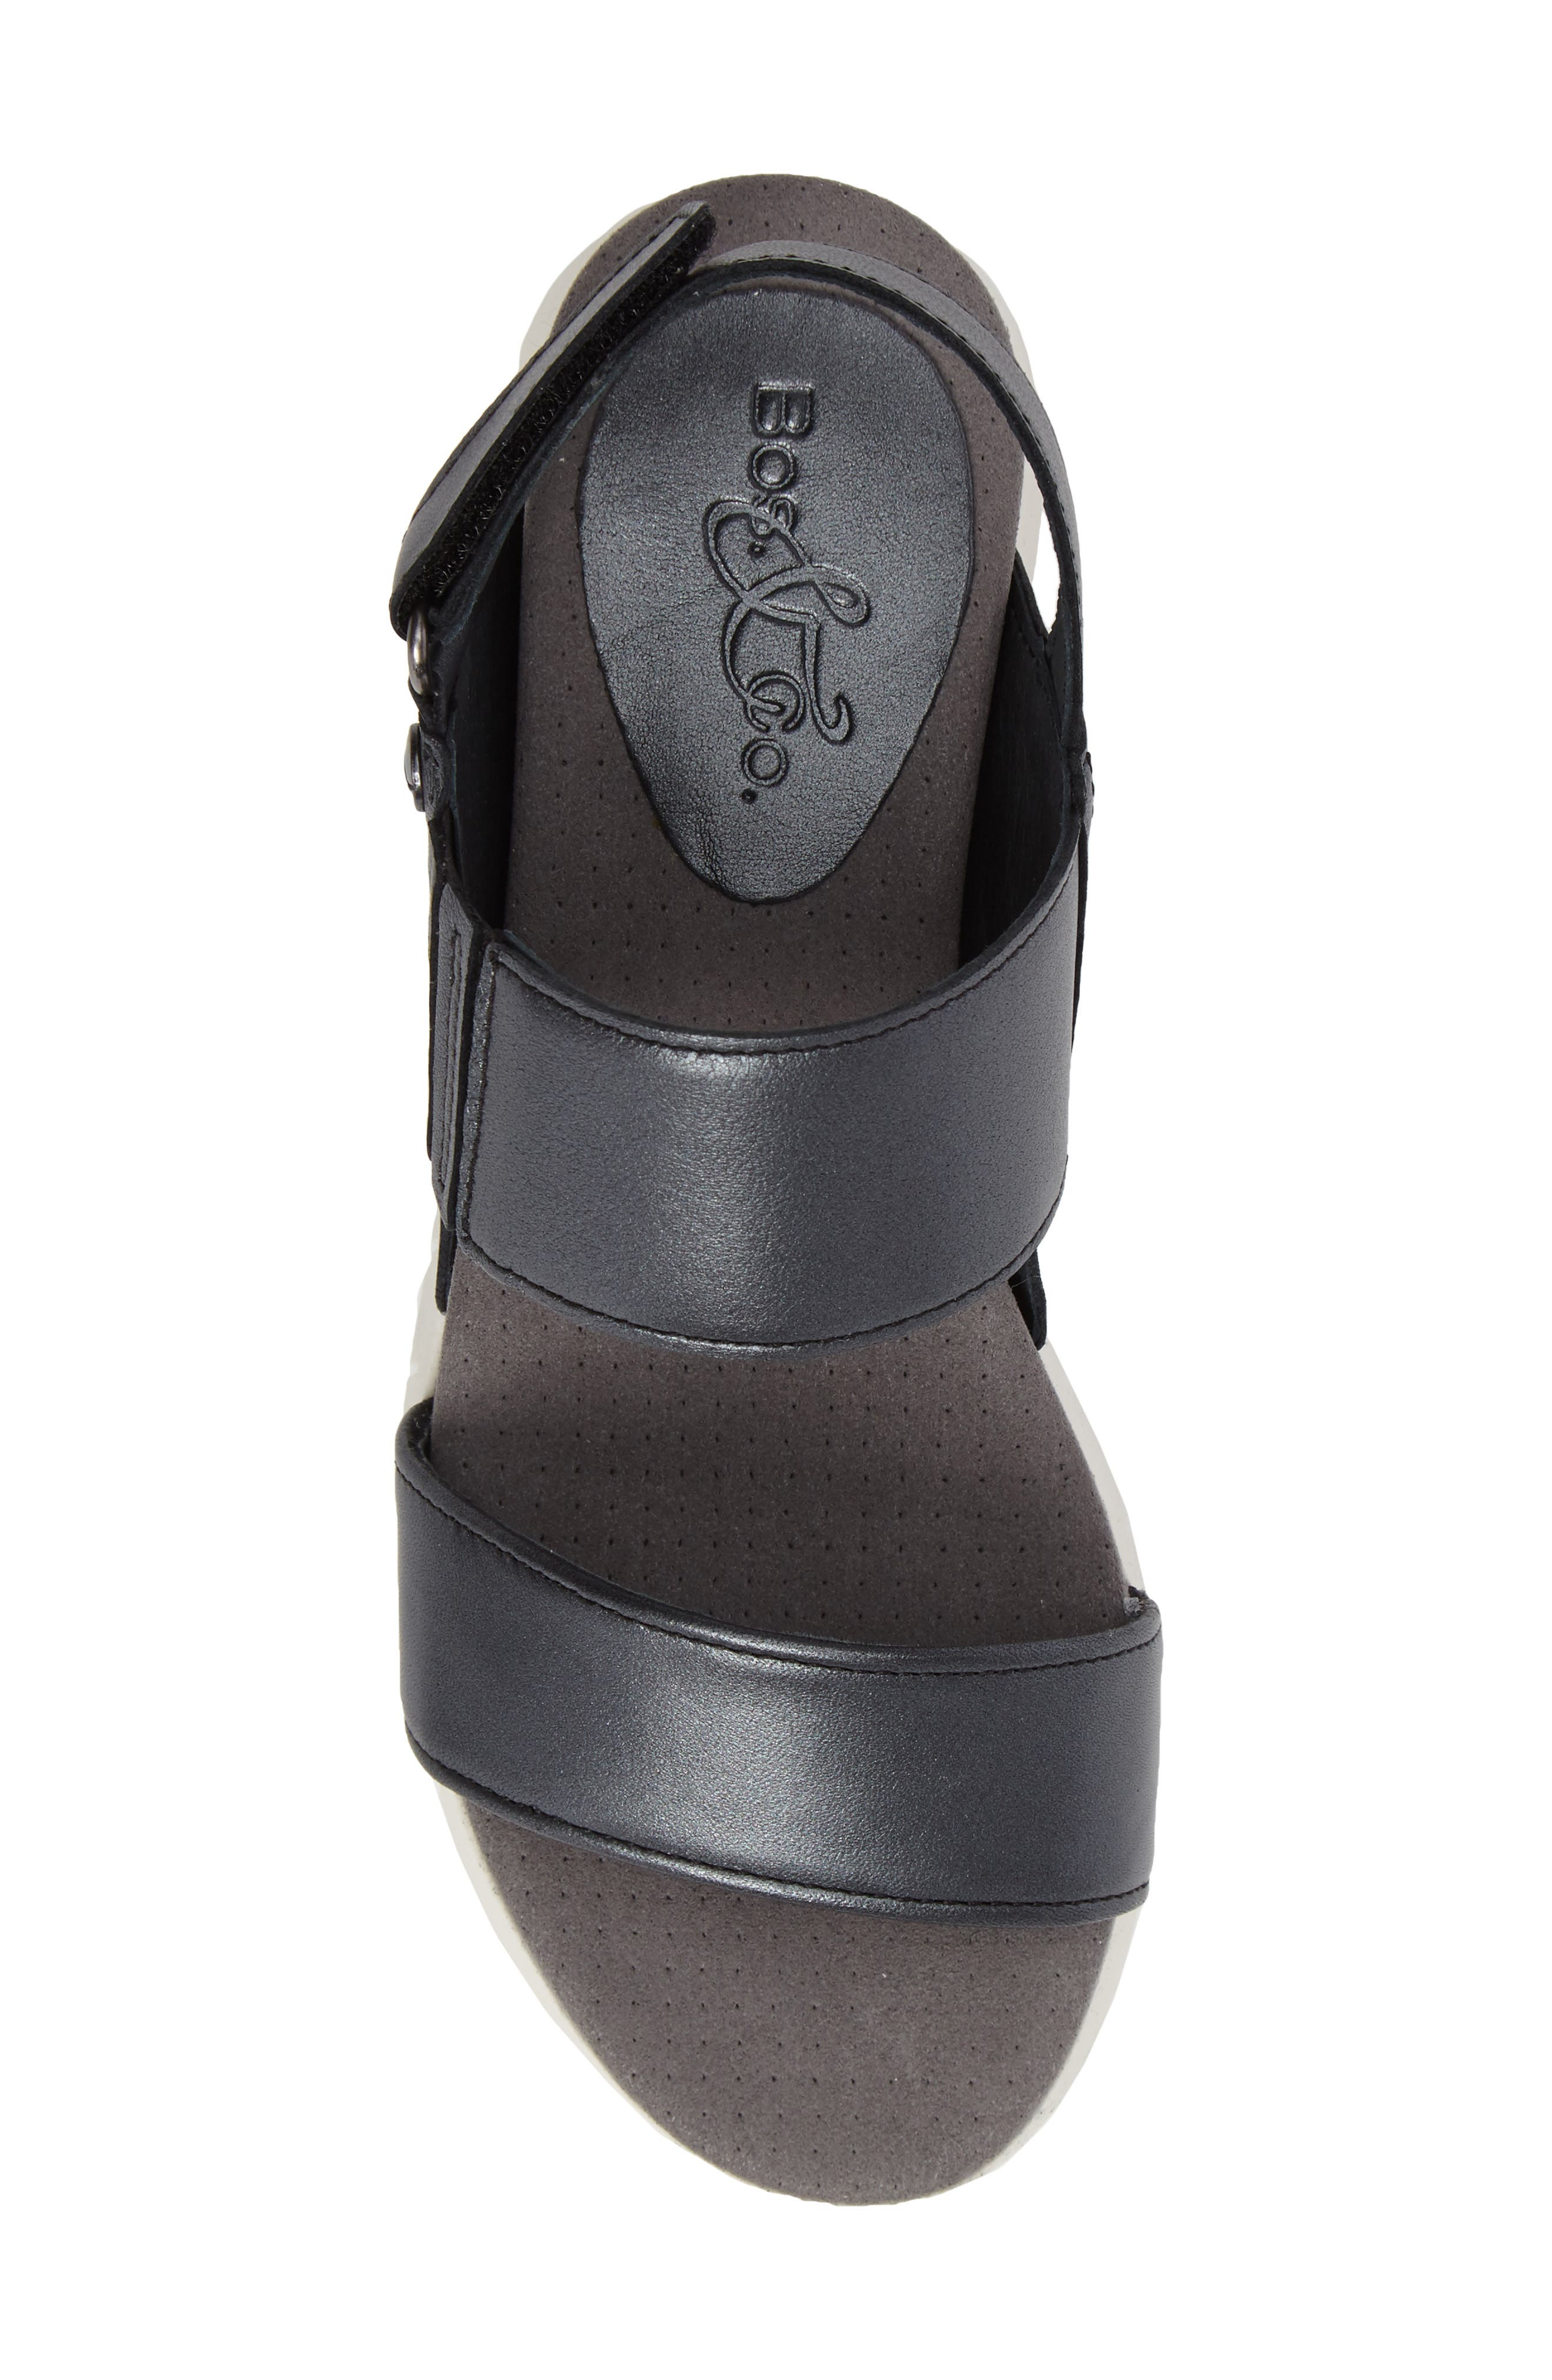 Payge Wedge Sandal,                             Alternate thumbnail 5, color,                             BLACK LEATHER